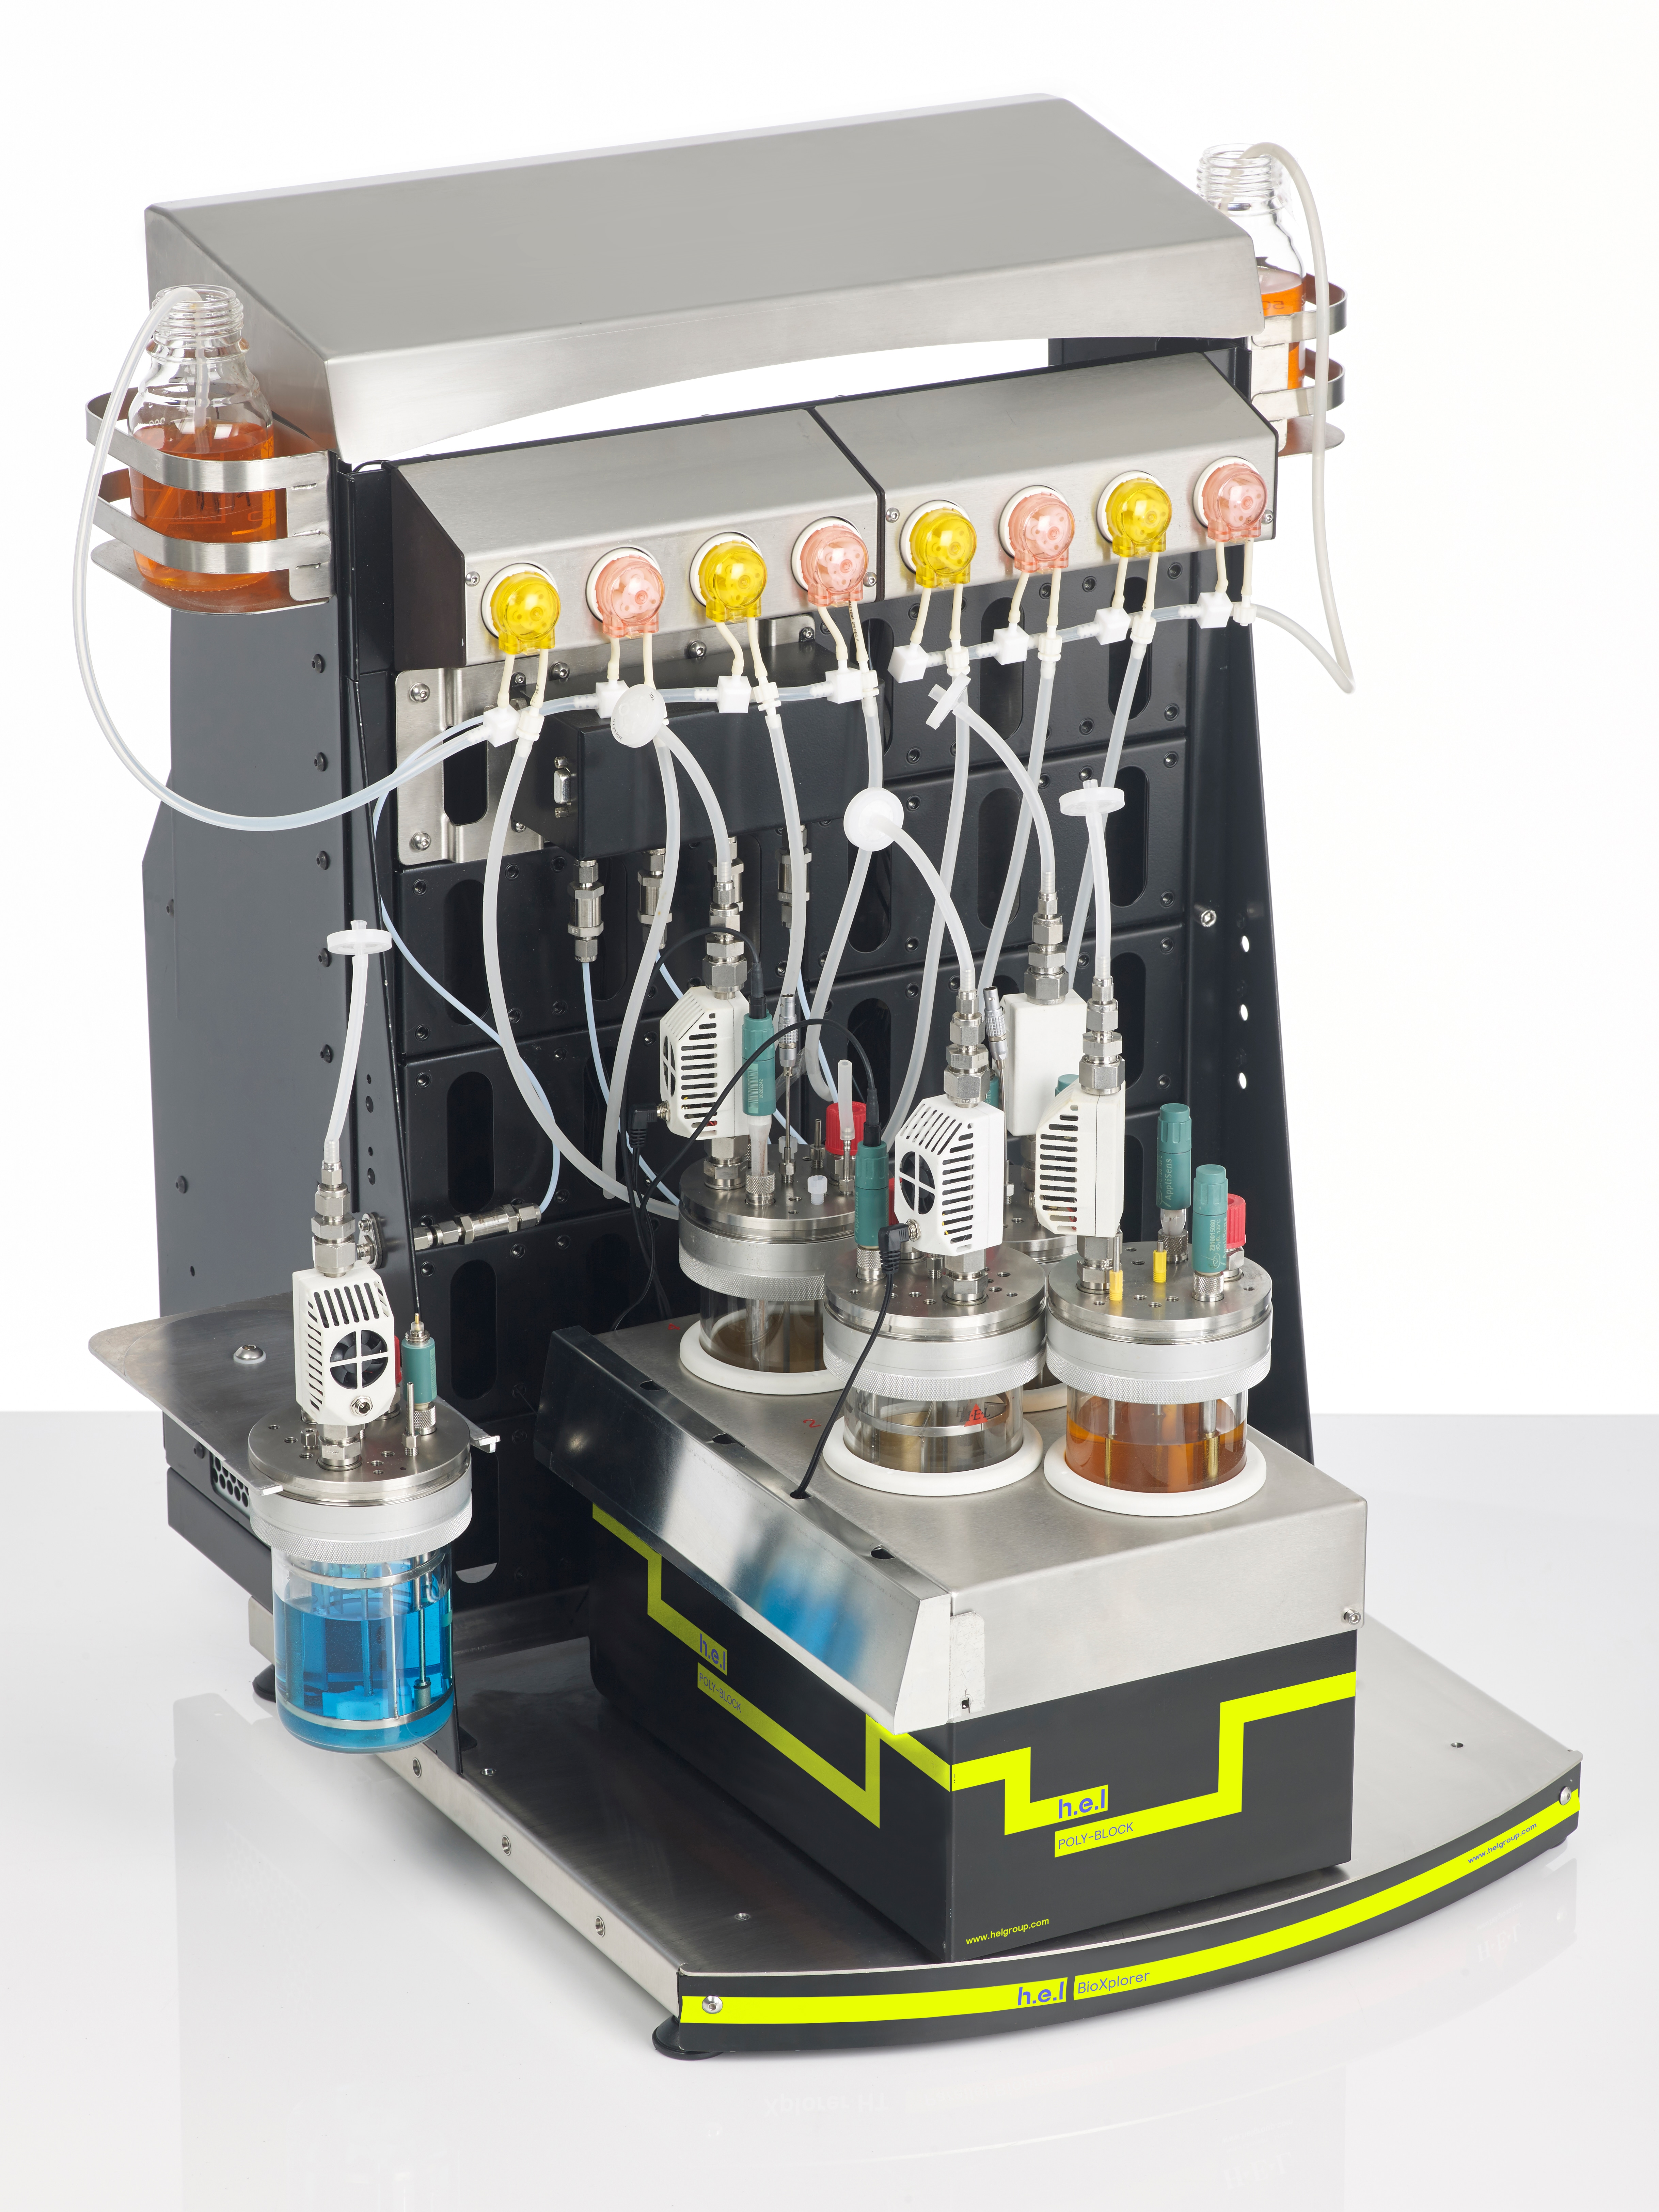 BioXplorer 400: Bench-top, 4 Bioreactor, Automated Parallel Biotechnology Platform